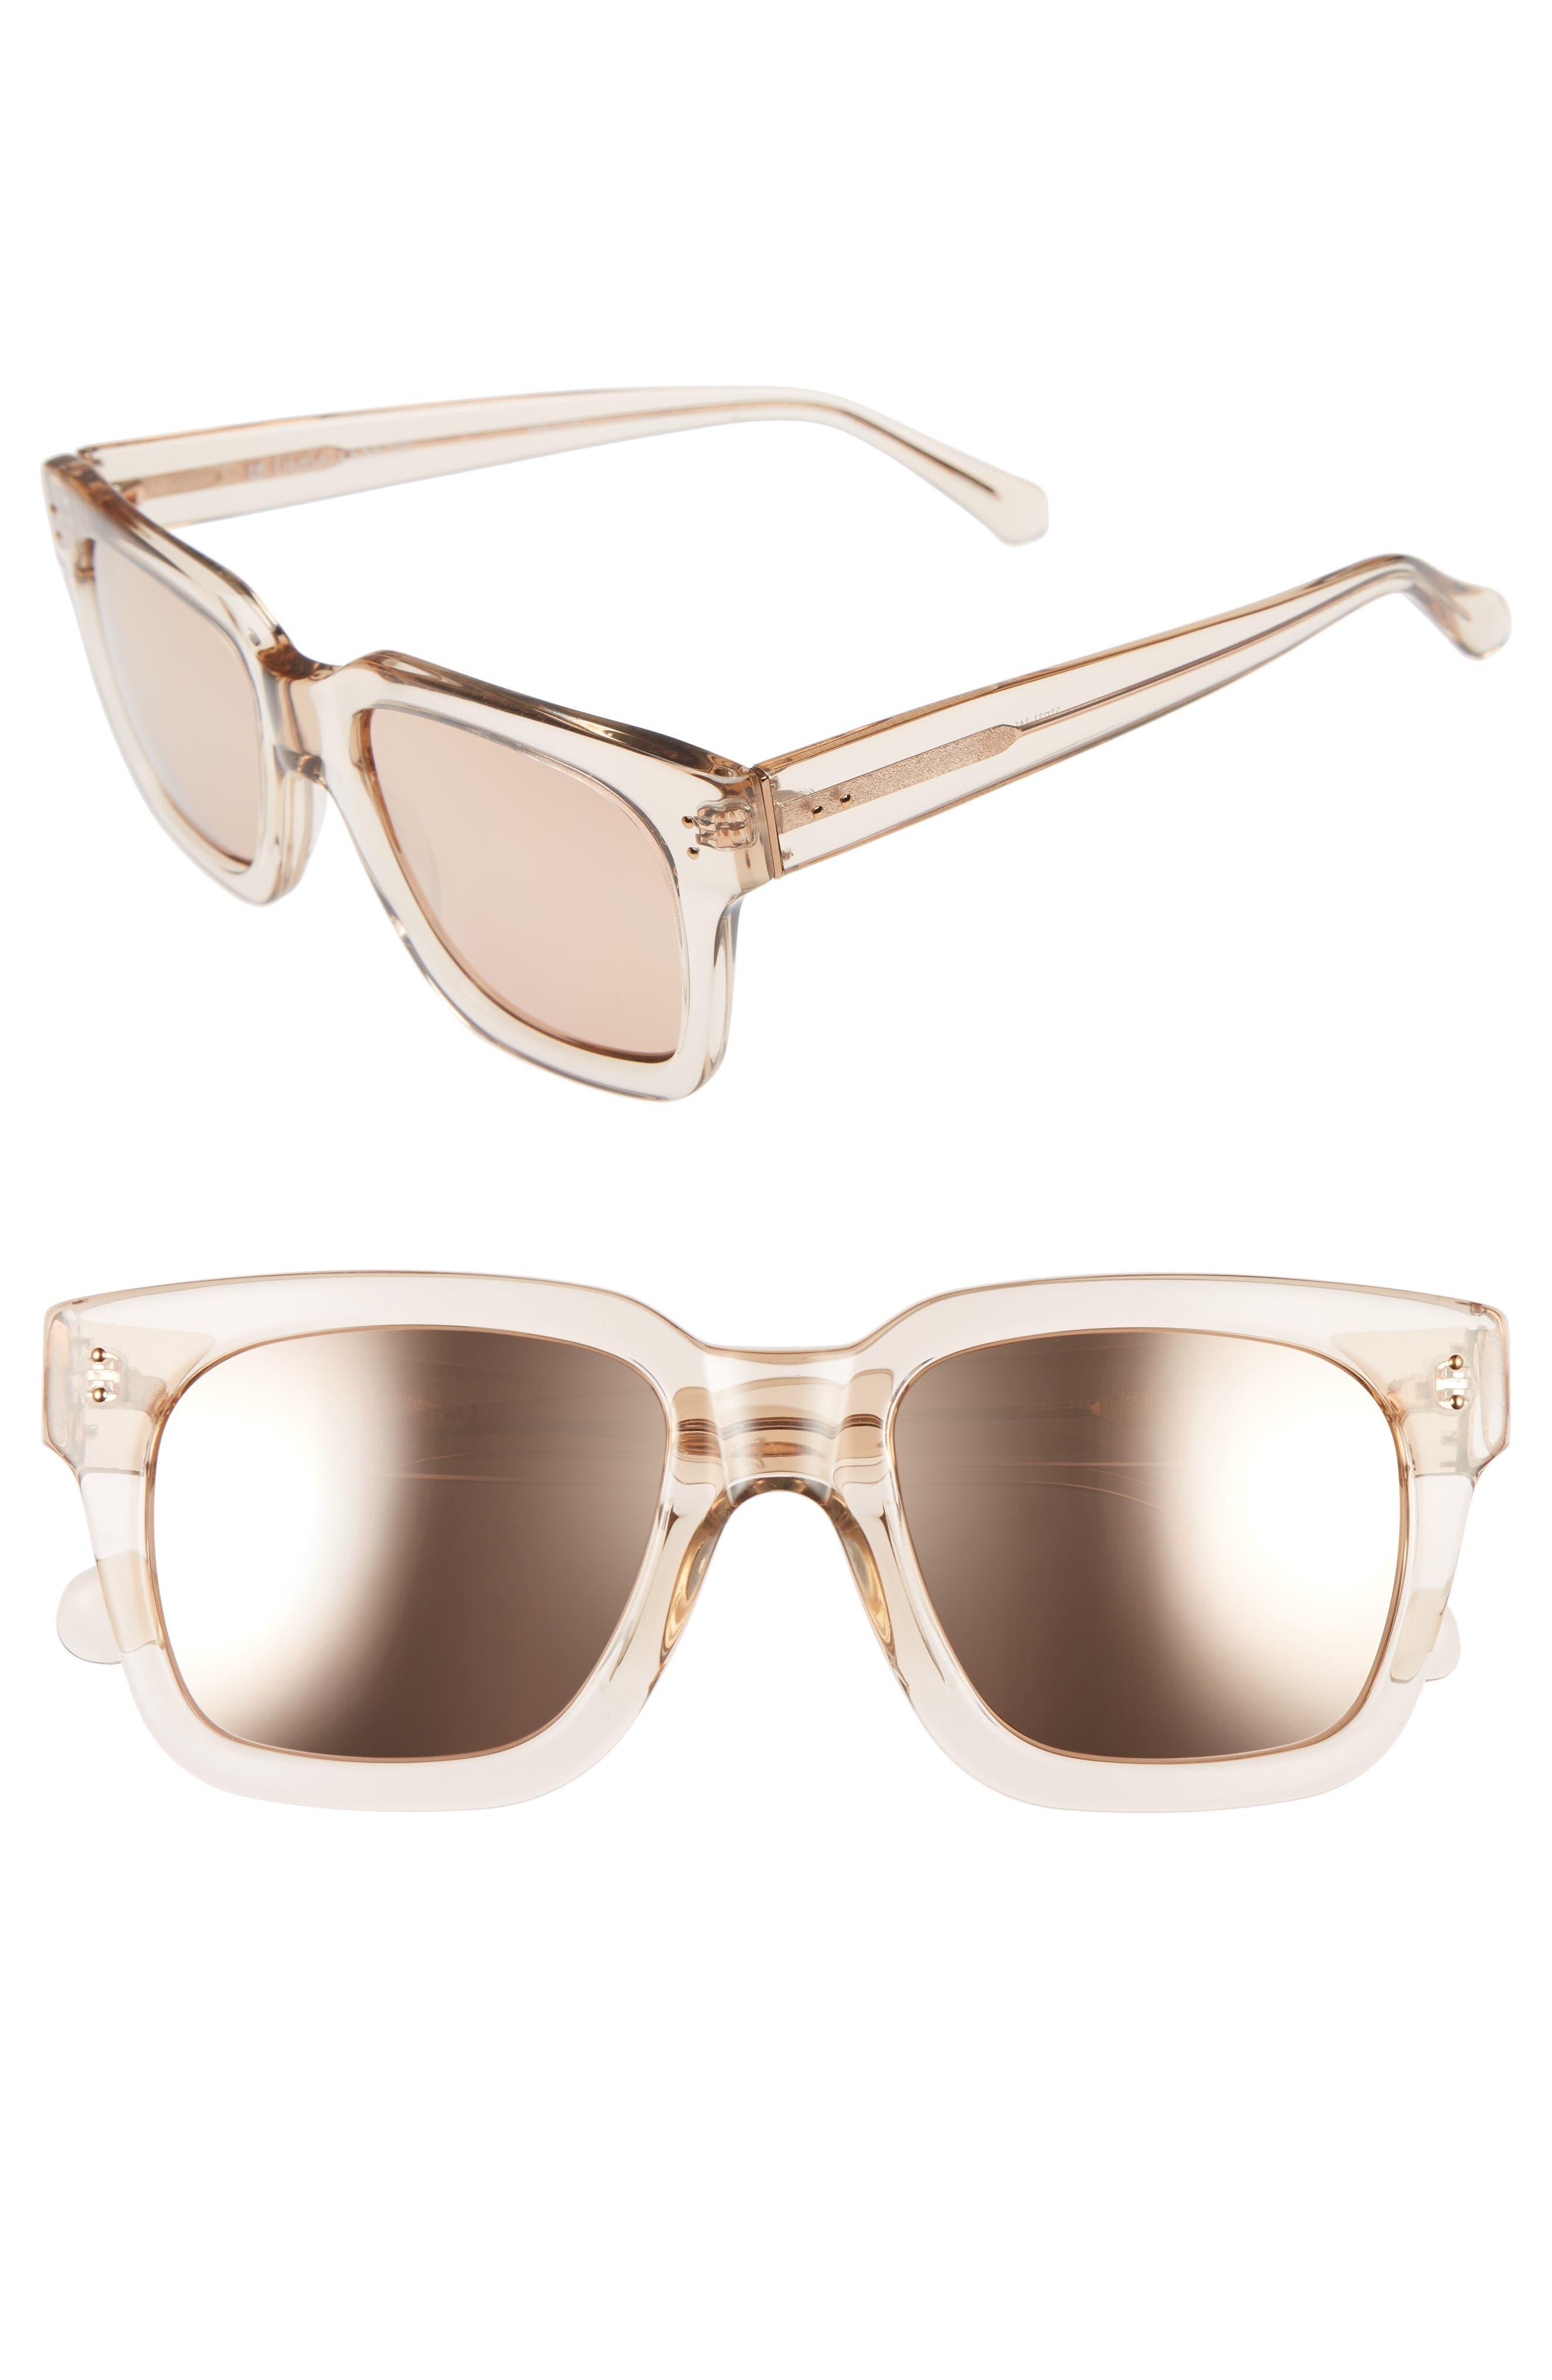 50mm Sunglasses,                             Main thumbnail 1, color,                             020